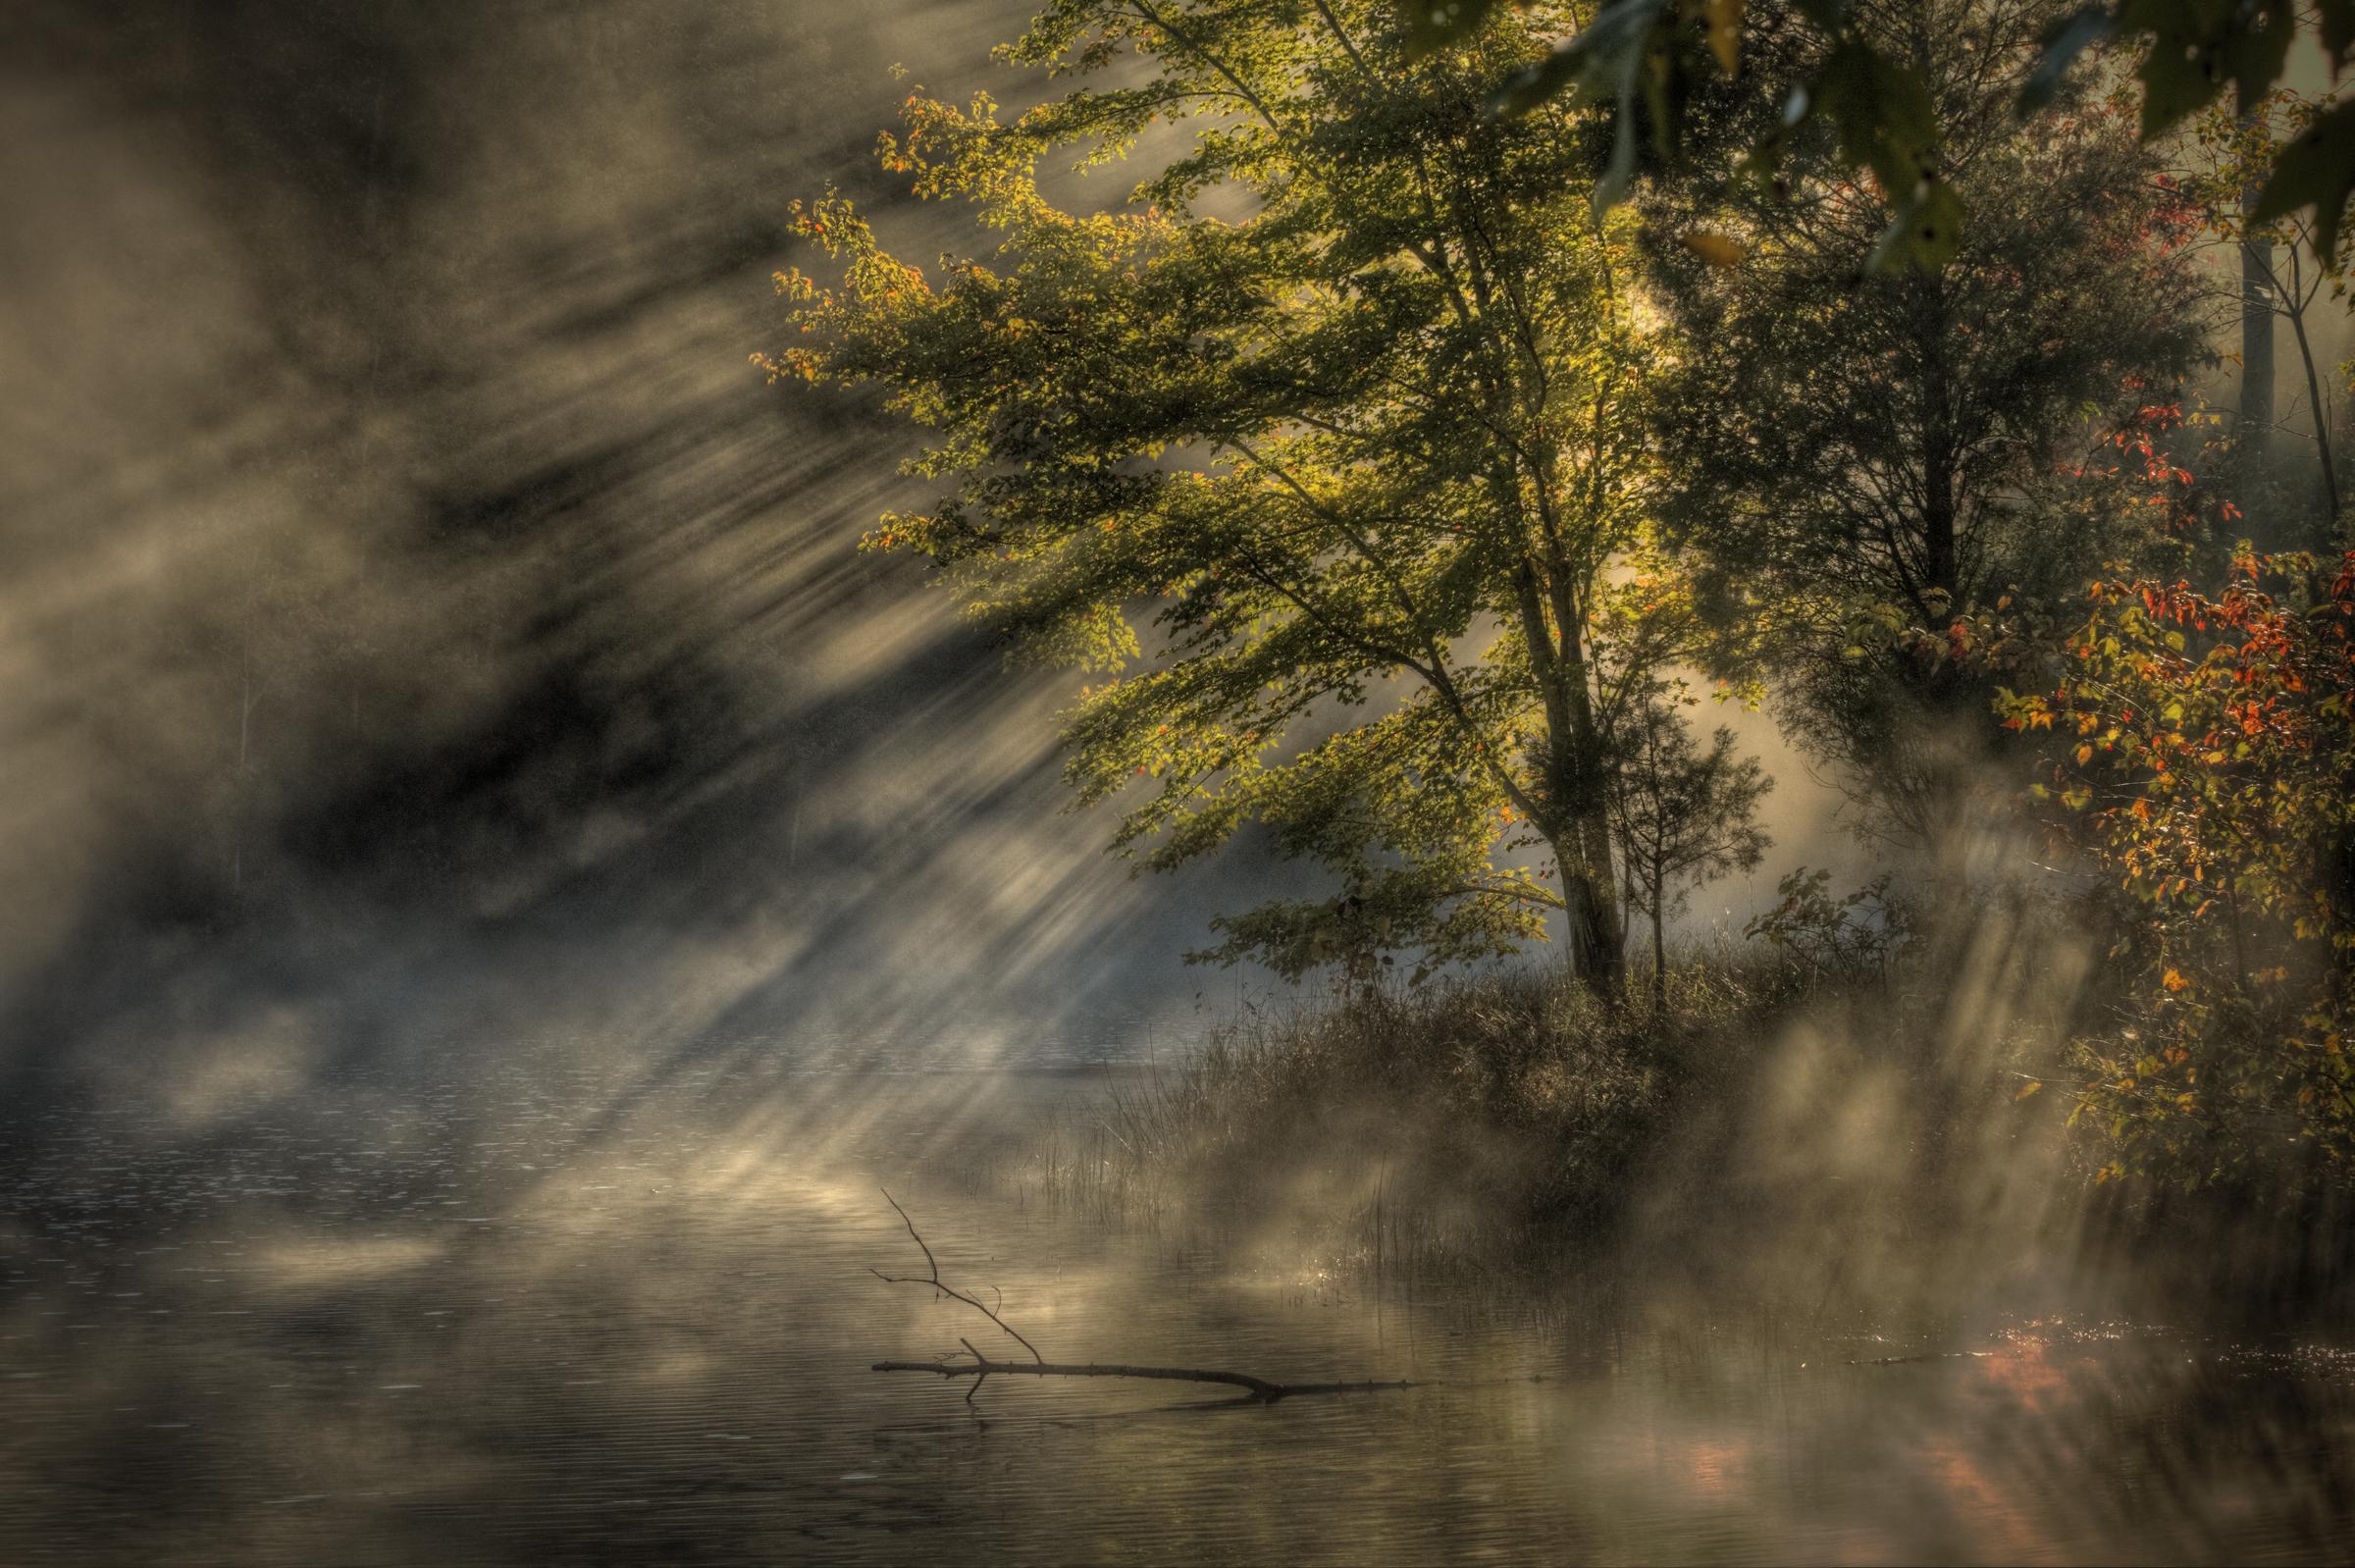 04 Apr Magic in the mist.jpg